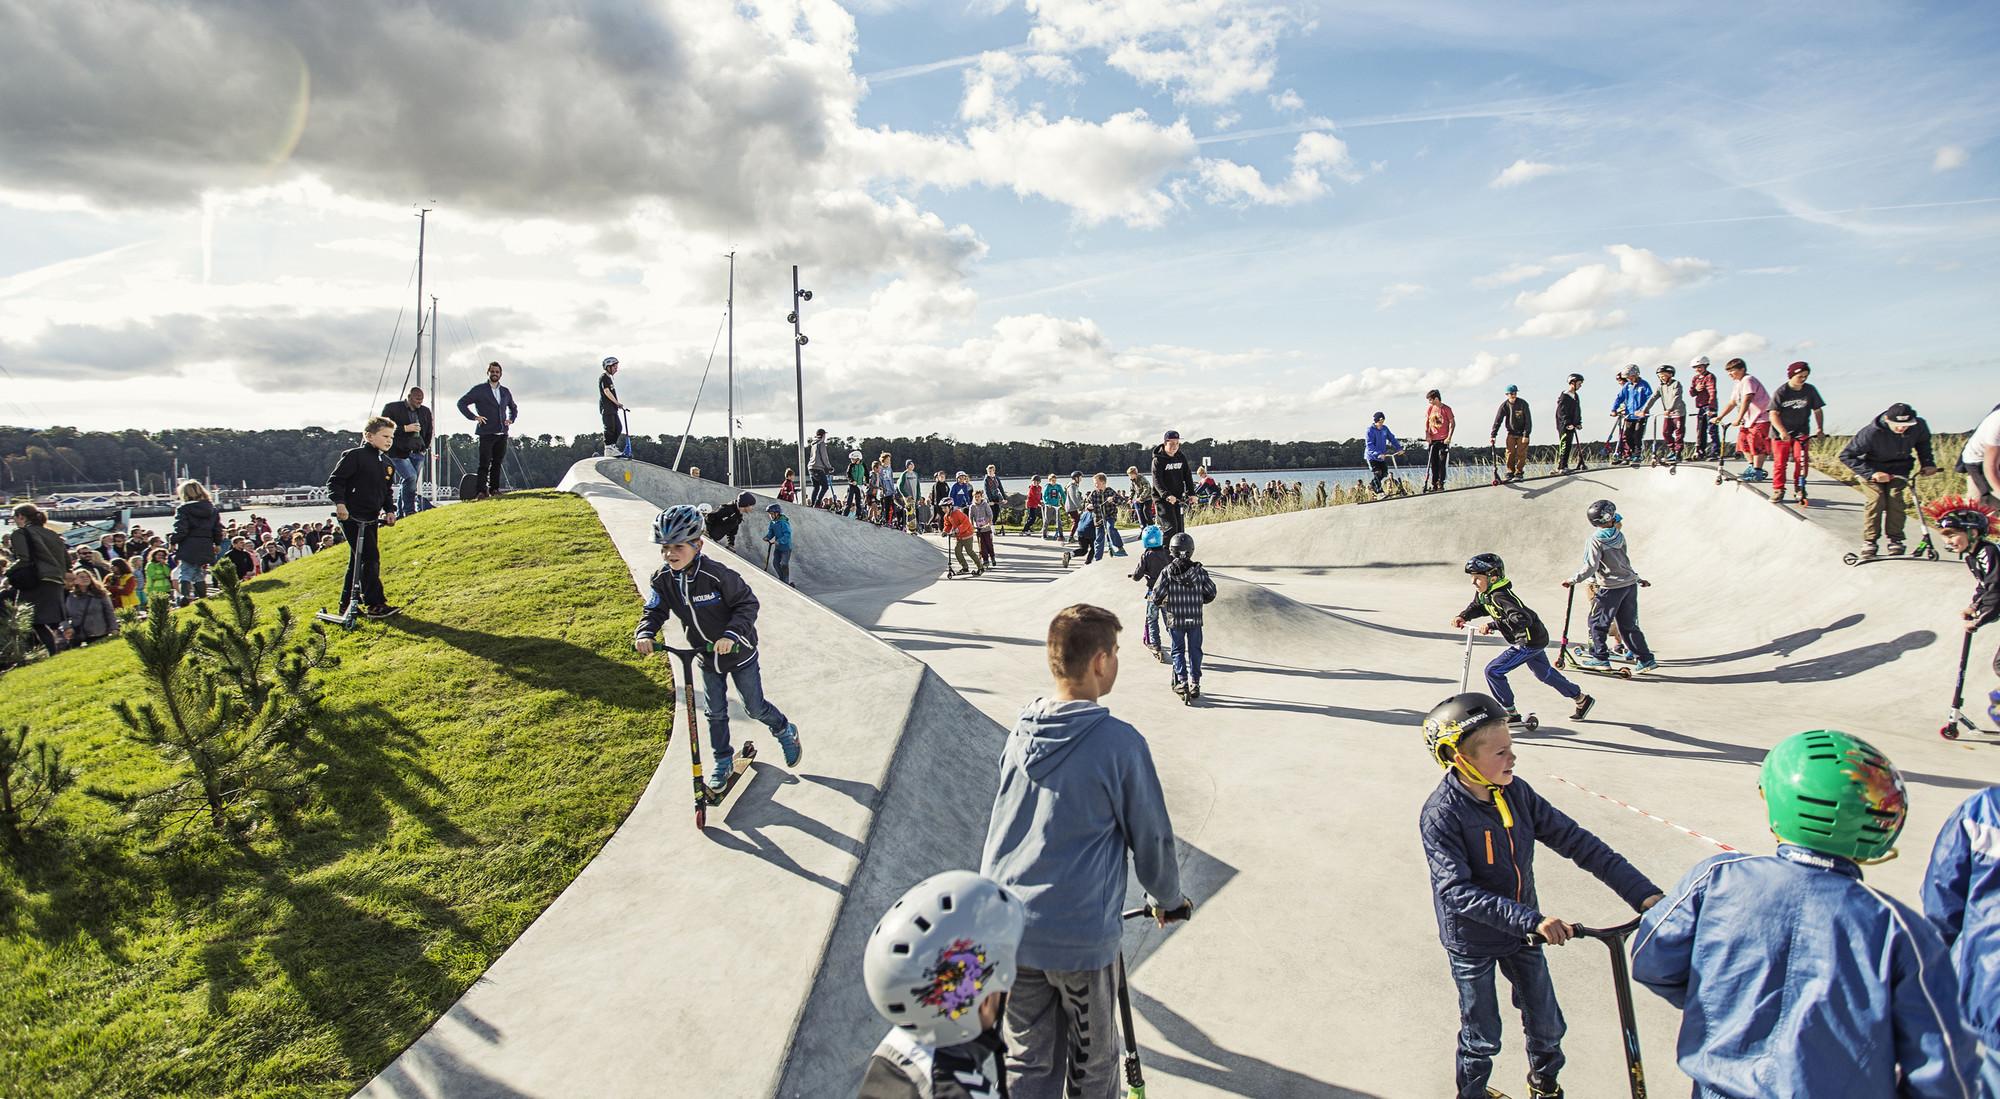 lemvig skatepark effekt archdaily